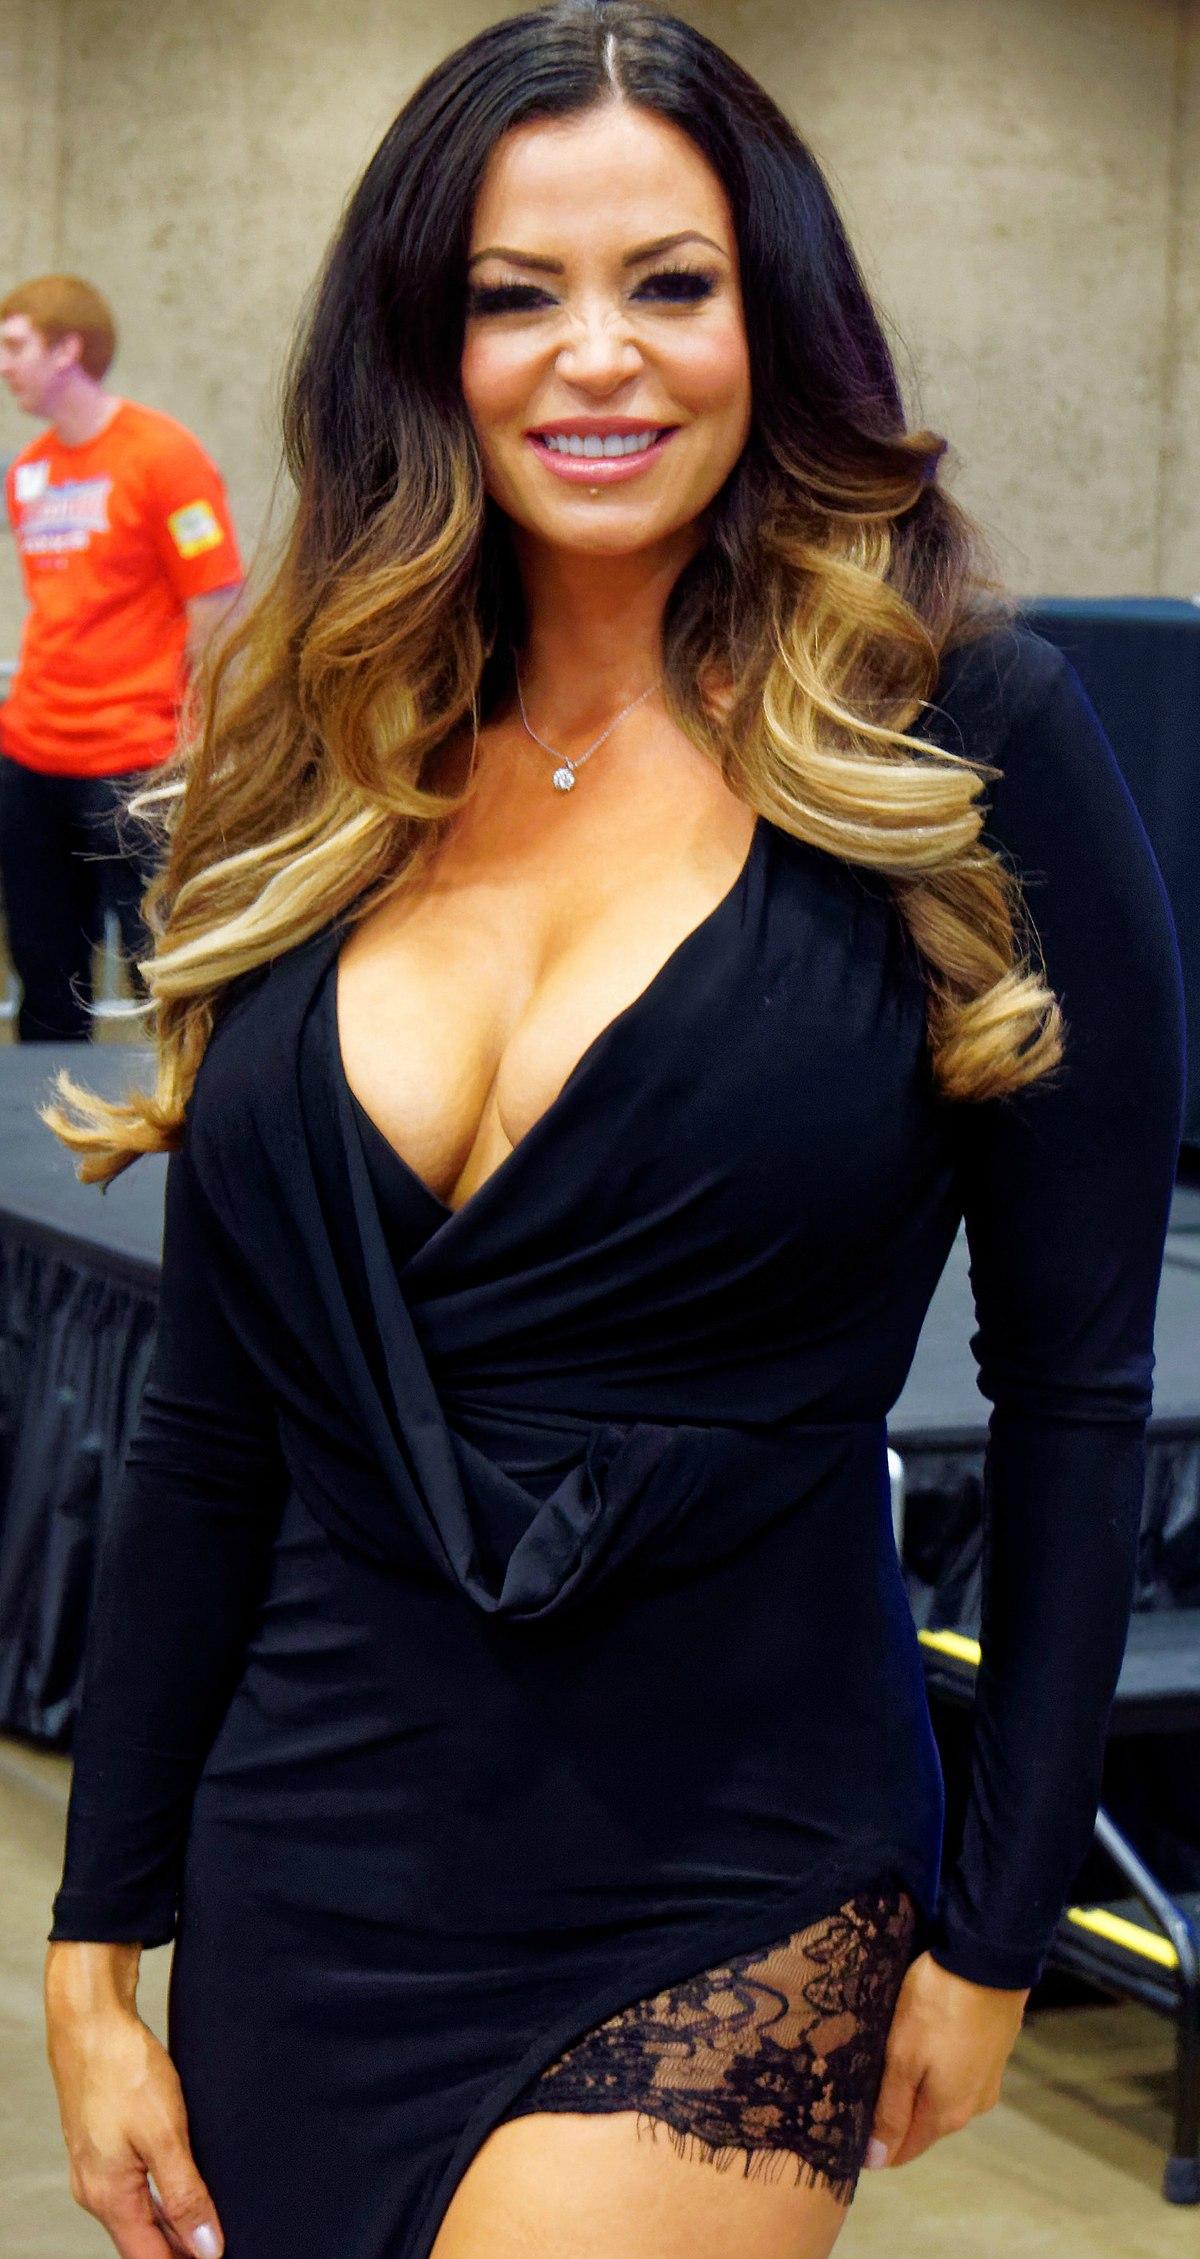 15 Reasons To Love Candice Michelle - Heyman Hustle